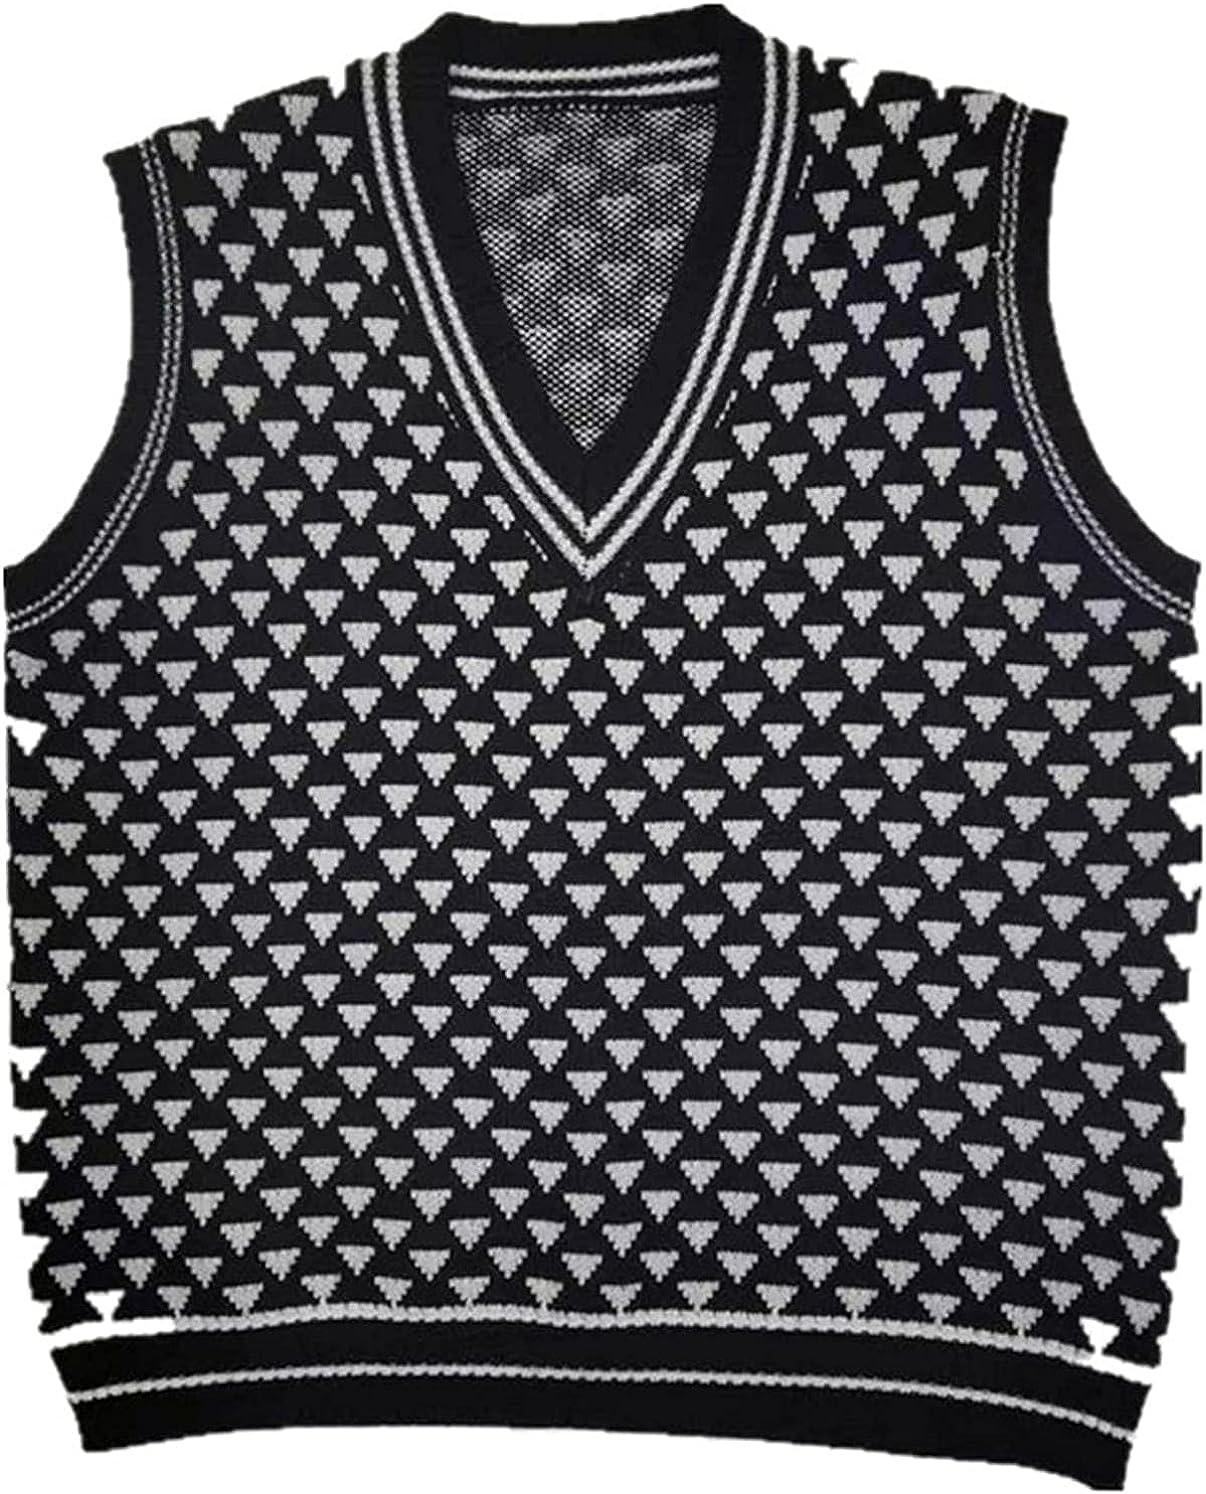 Women's Kawaii Triangle Pattern Sweater Vest V Neck Sleeveless Knitted Tops